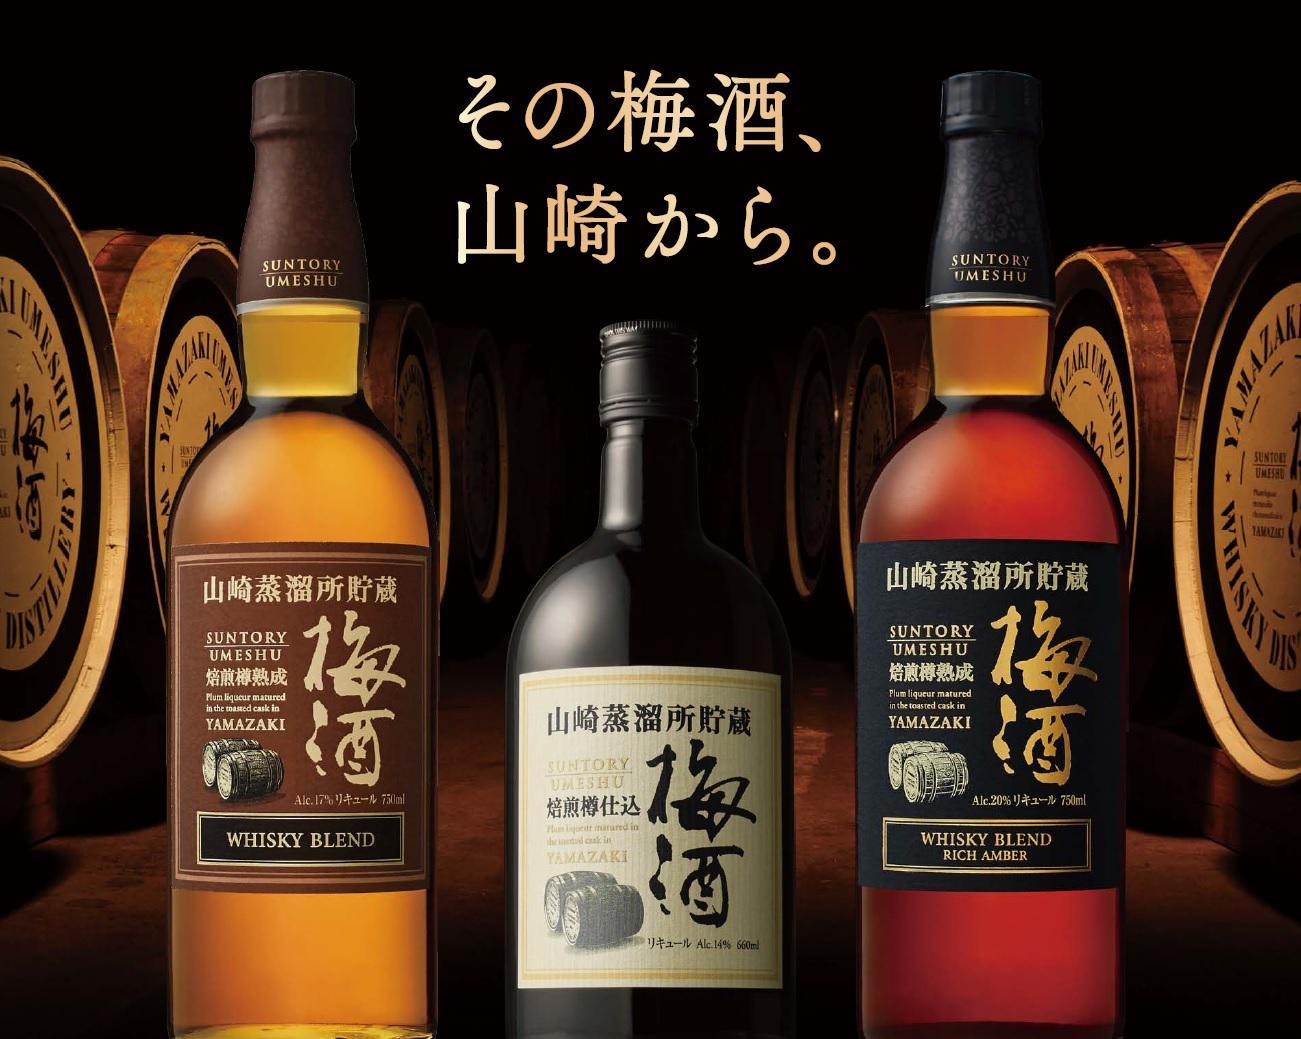 「山崎蒸溜所貯蔵梅酒」シリーズ